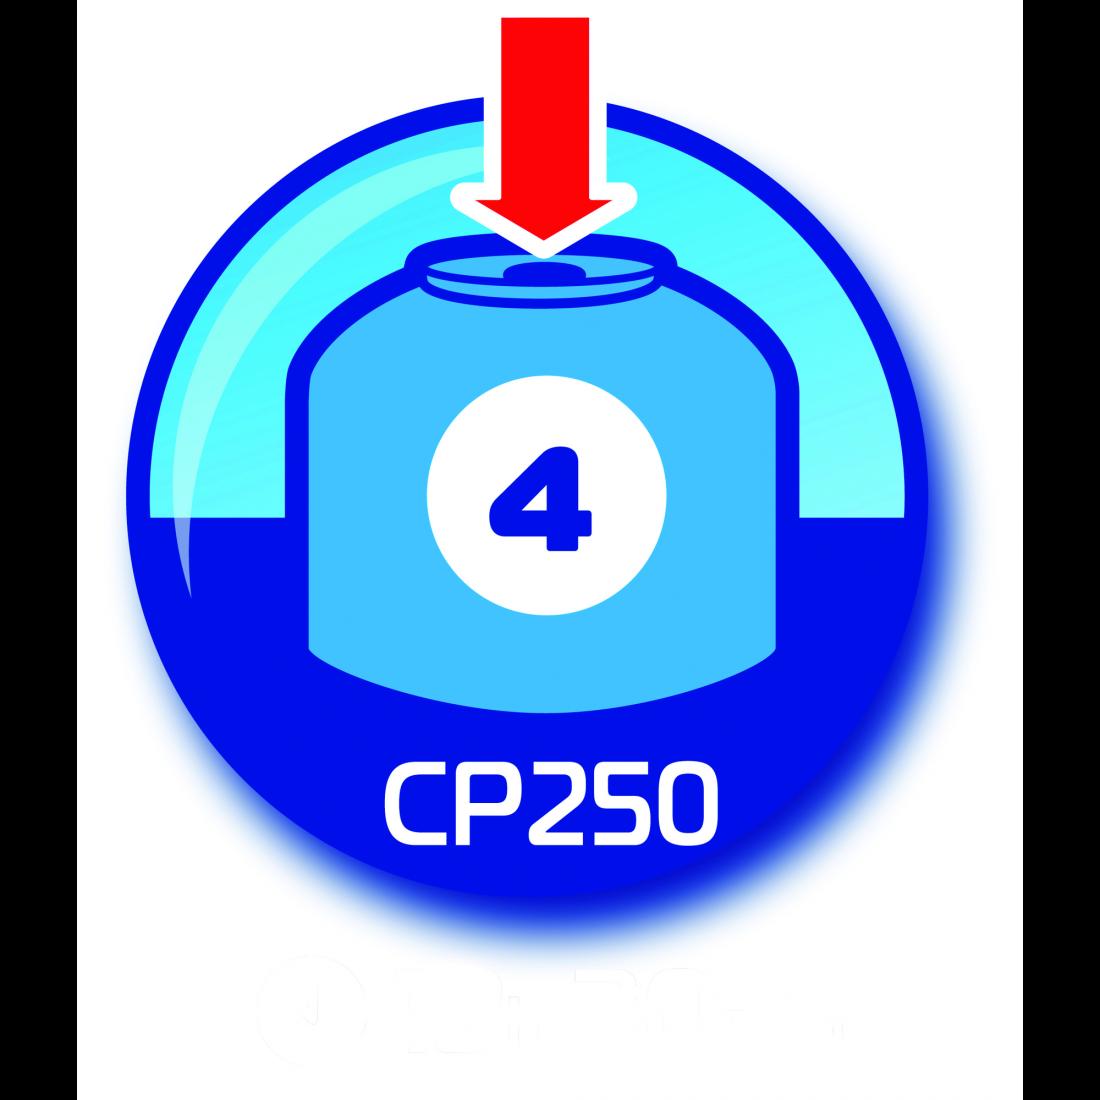 Campingaz cp 250 ventil gaskartusche isobutan 450ml 250g ebay - Cartouche gaz cp 250 ...